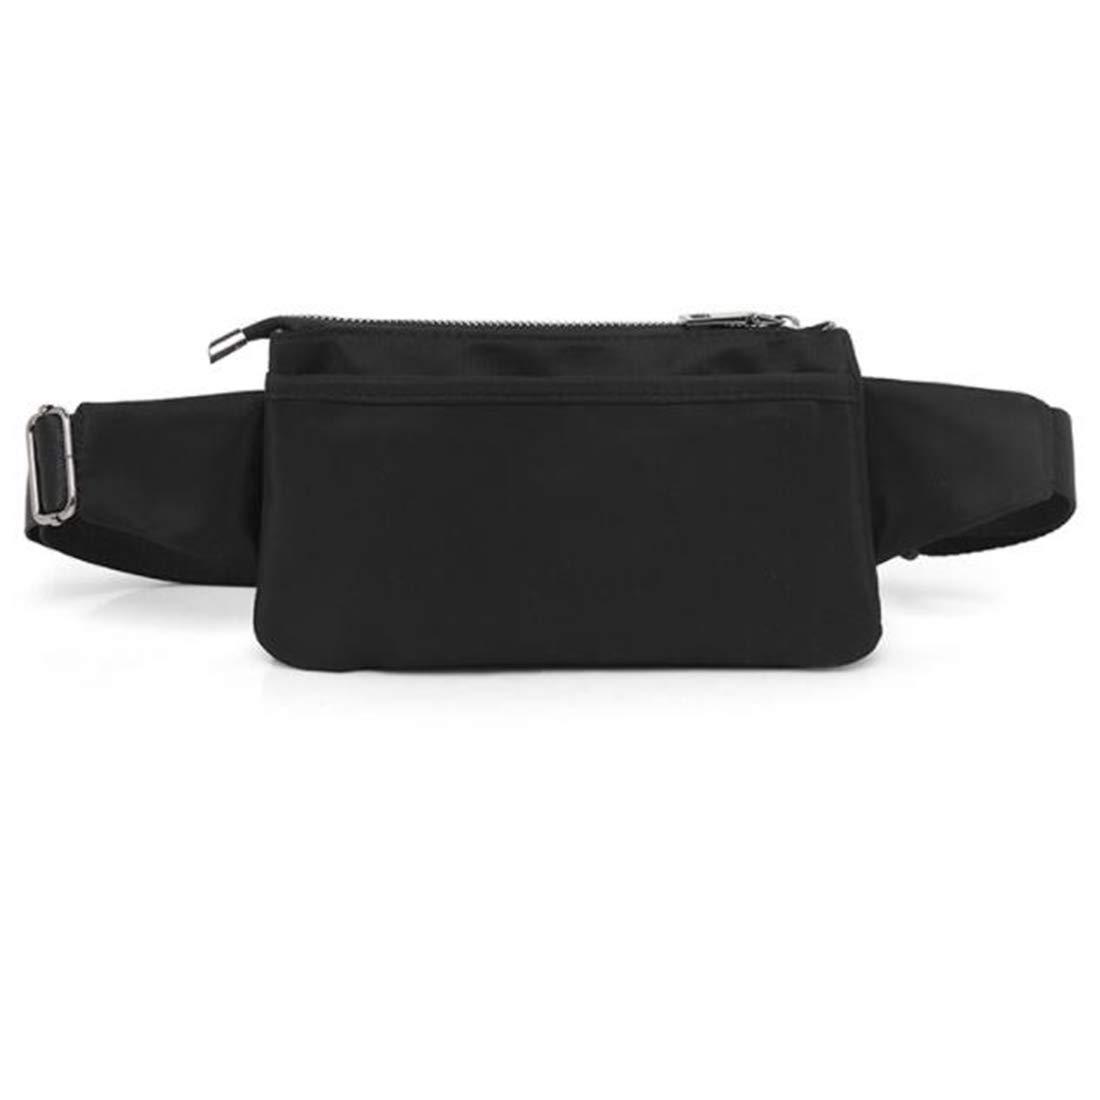 Color : Black RABILTY Waist Bag West Pouch Body Bag Fashion Waterproof Super Lightweight Sports